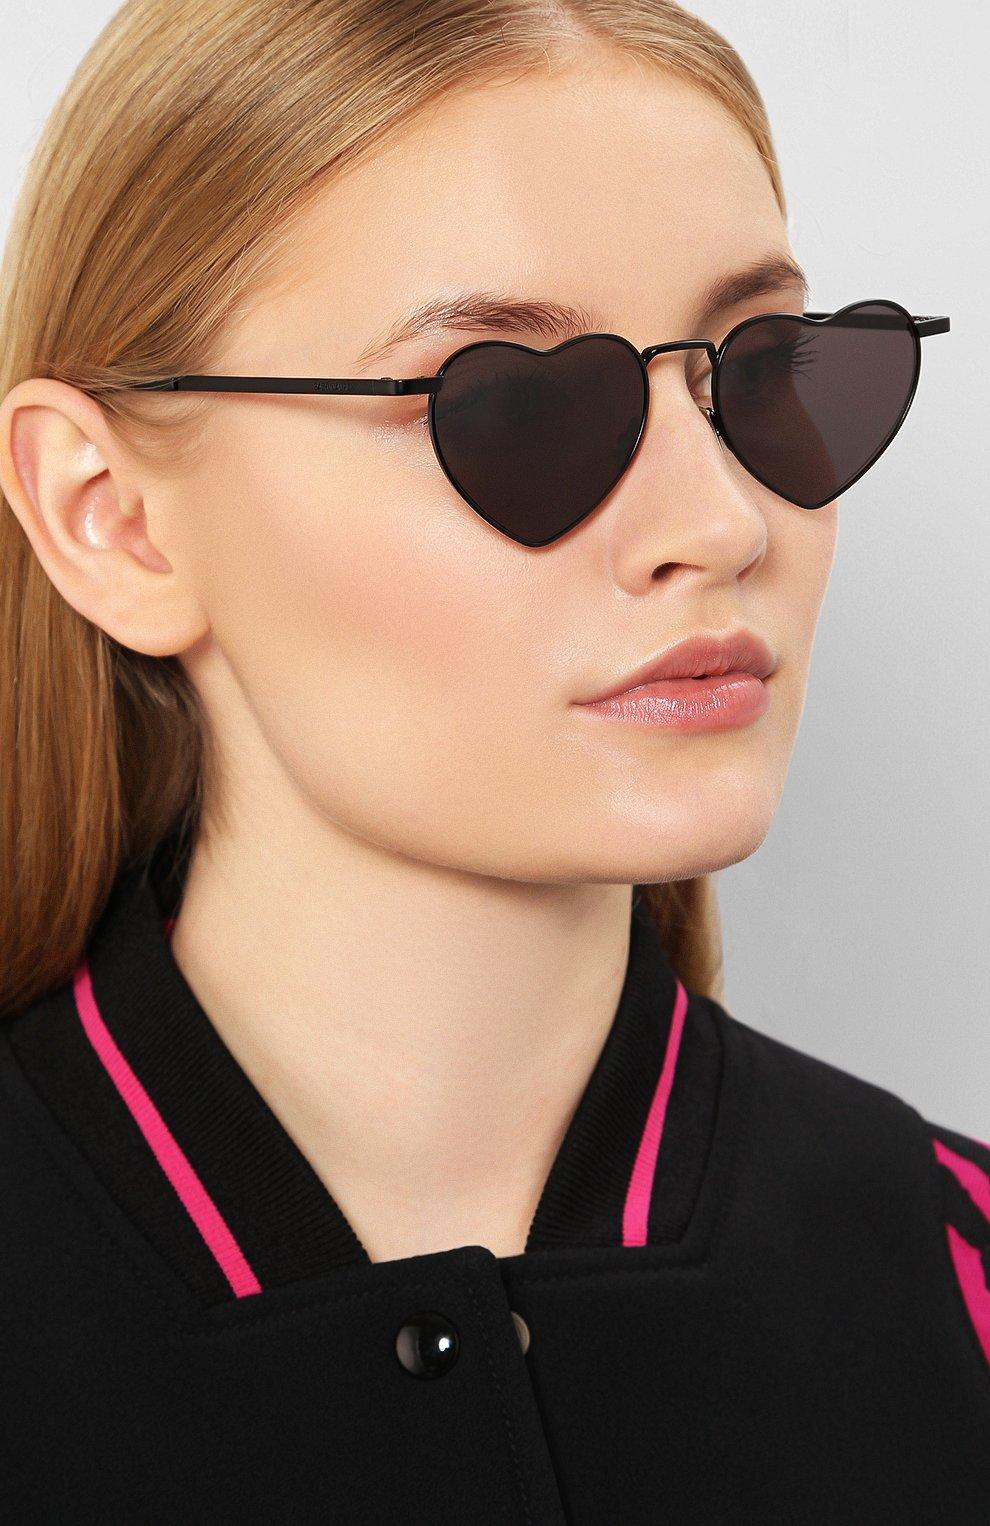 Женские солнцезащитные очки SAINT LAURENT черного цвета, арт. SL 301 L0UL0U 002 | Фото 2